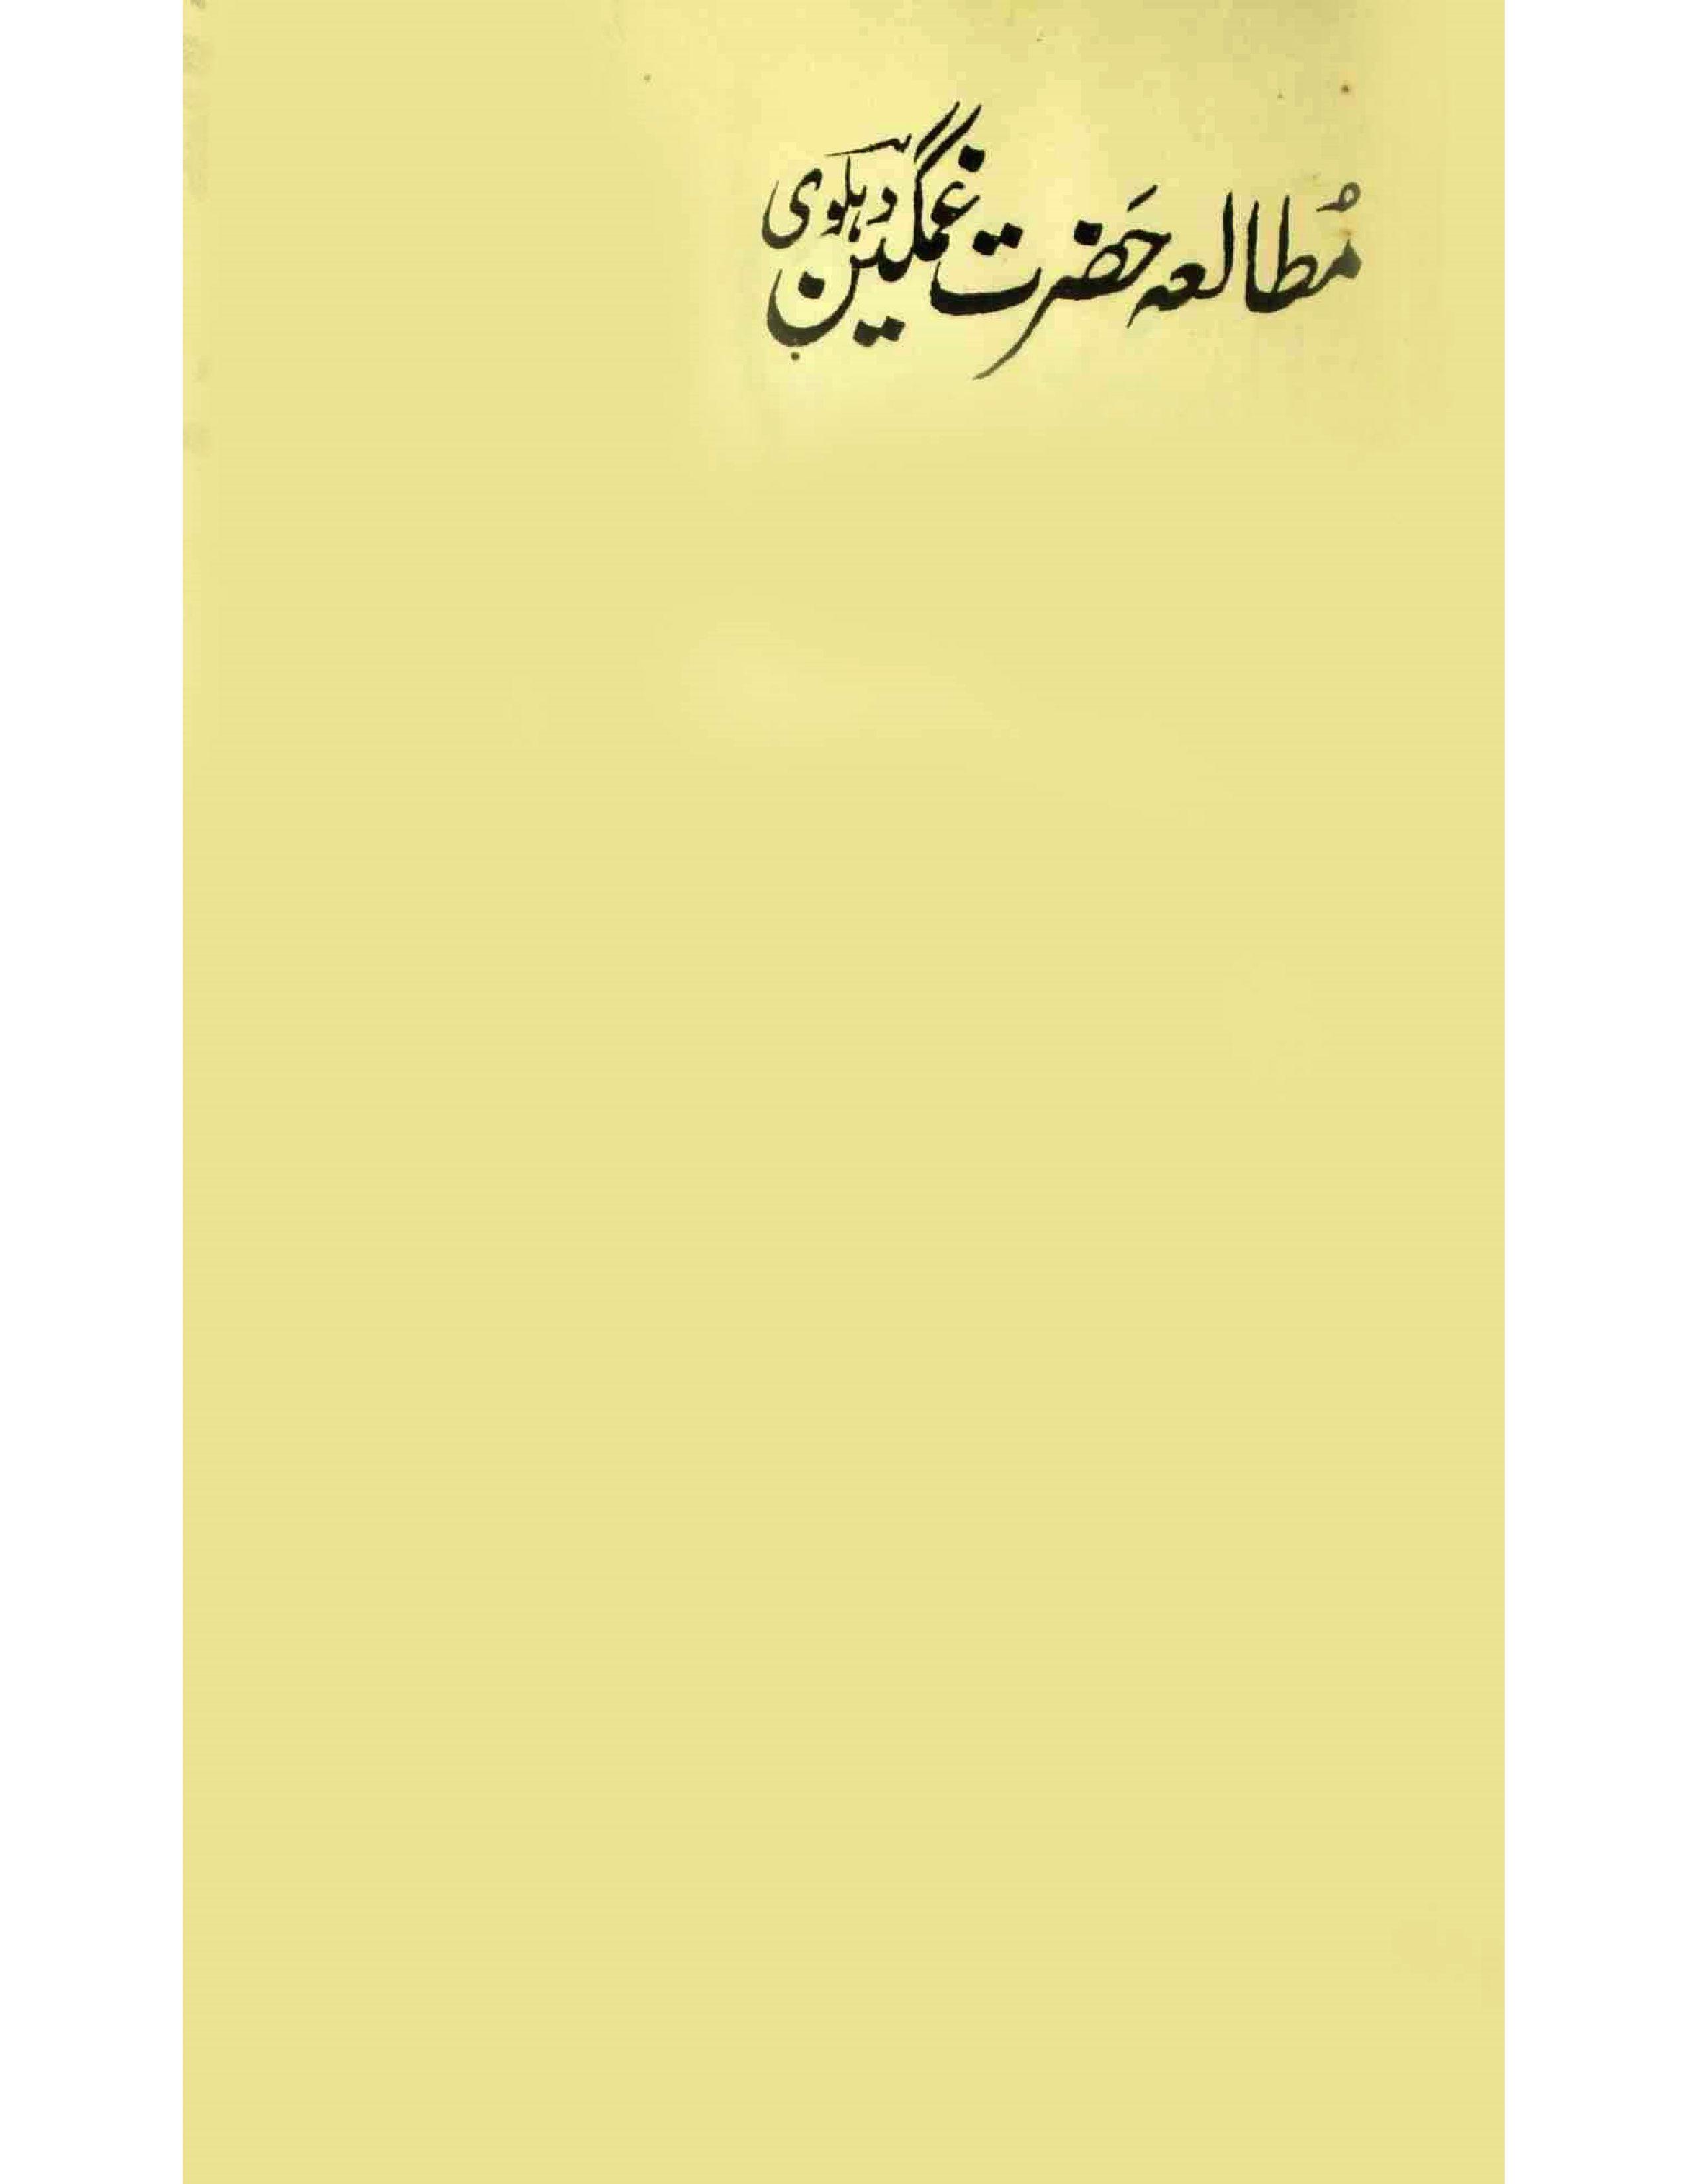 Mutala-e-Hazrat Ghamgin Dehlvi